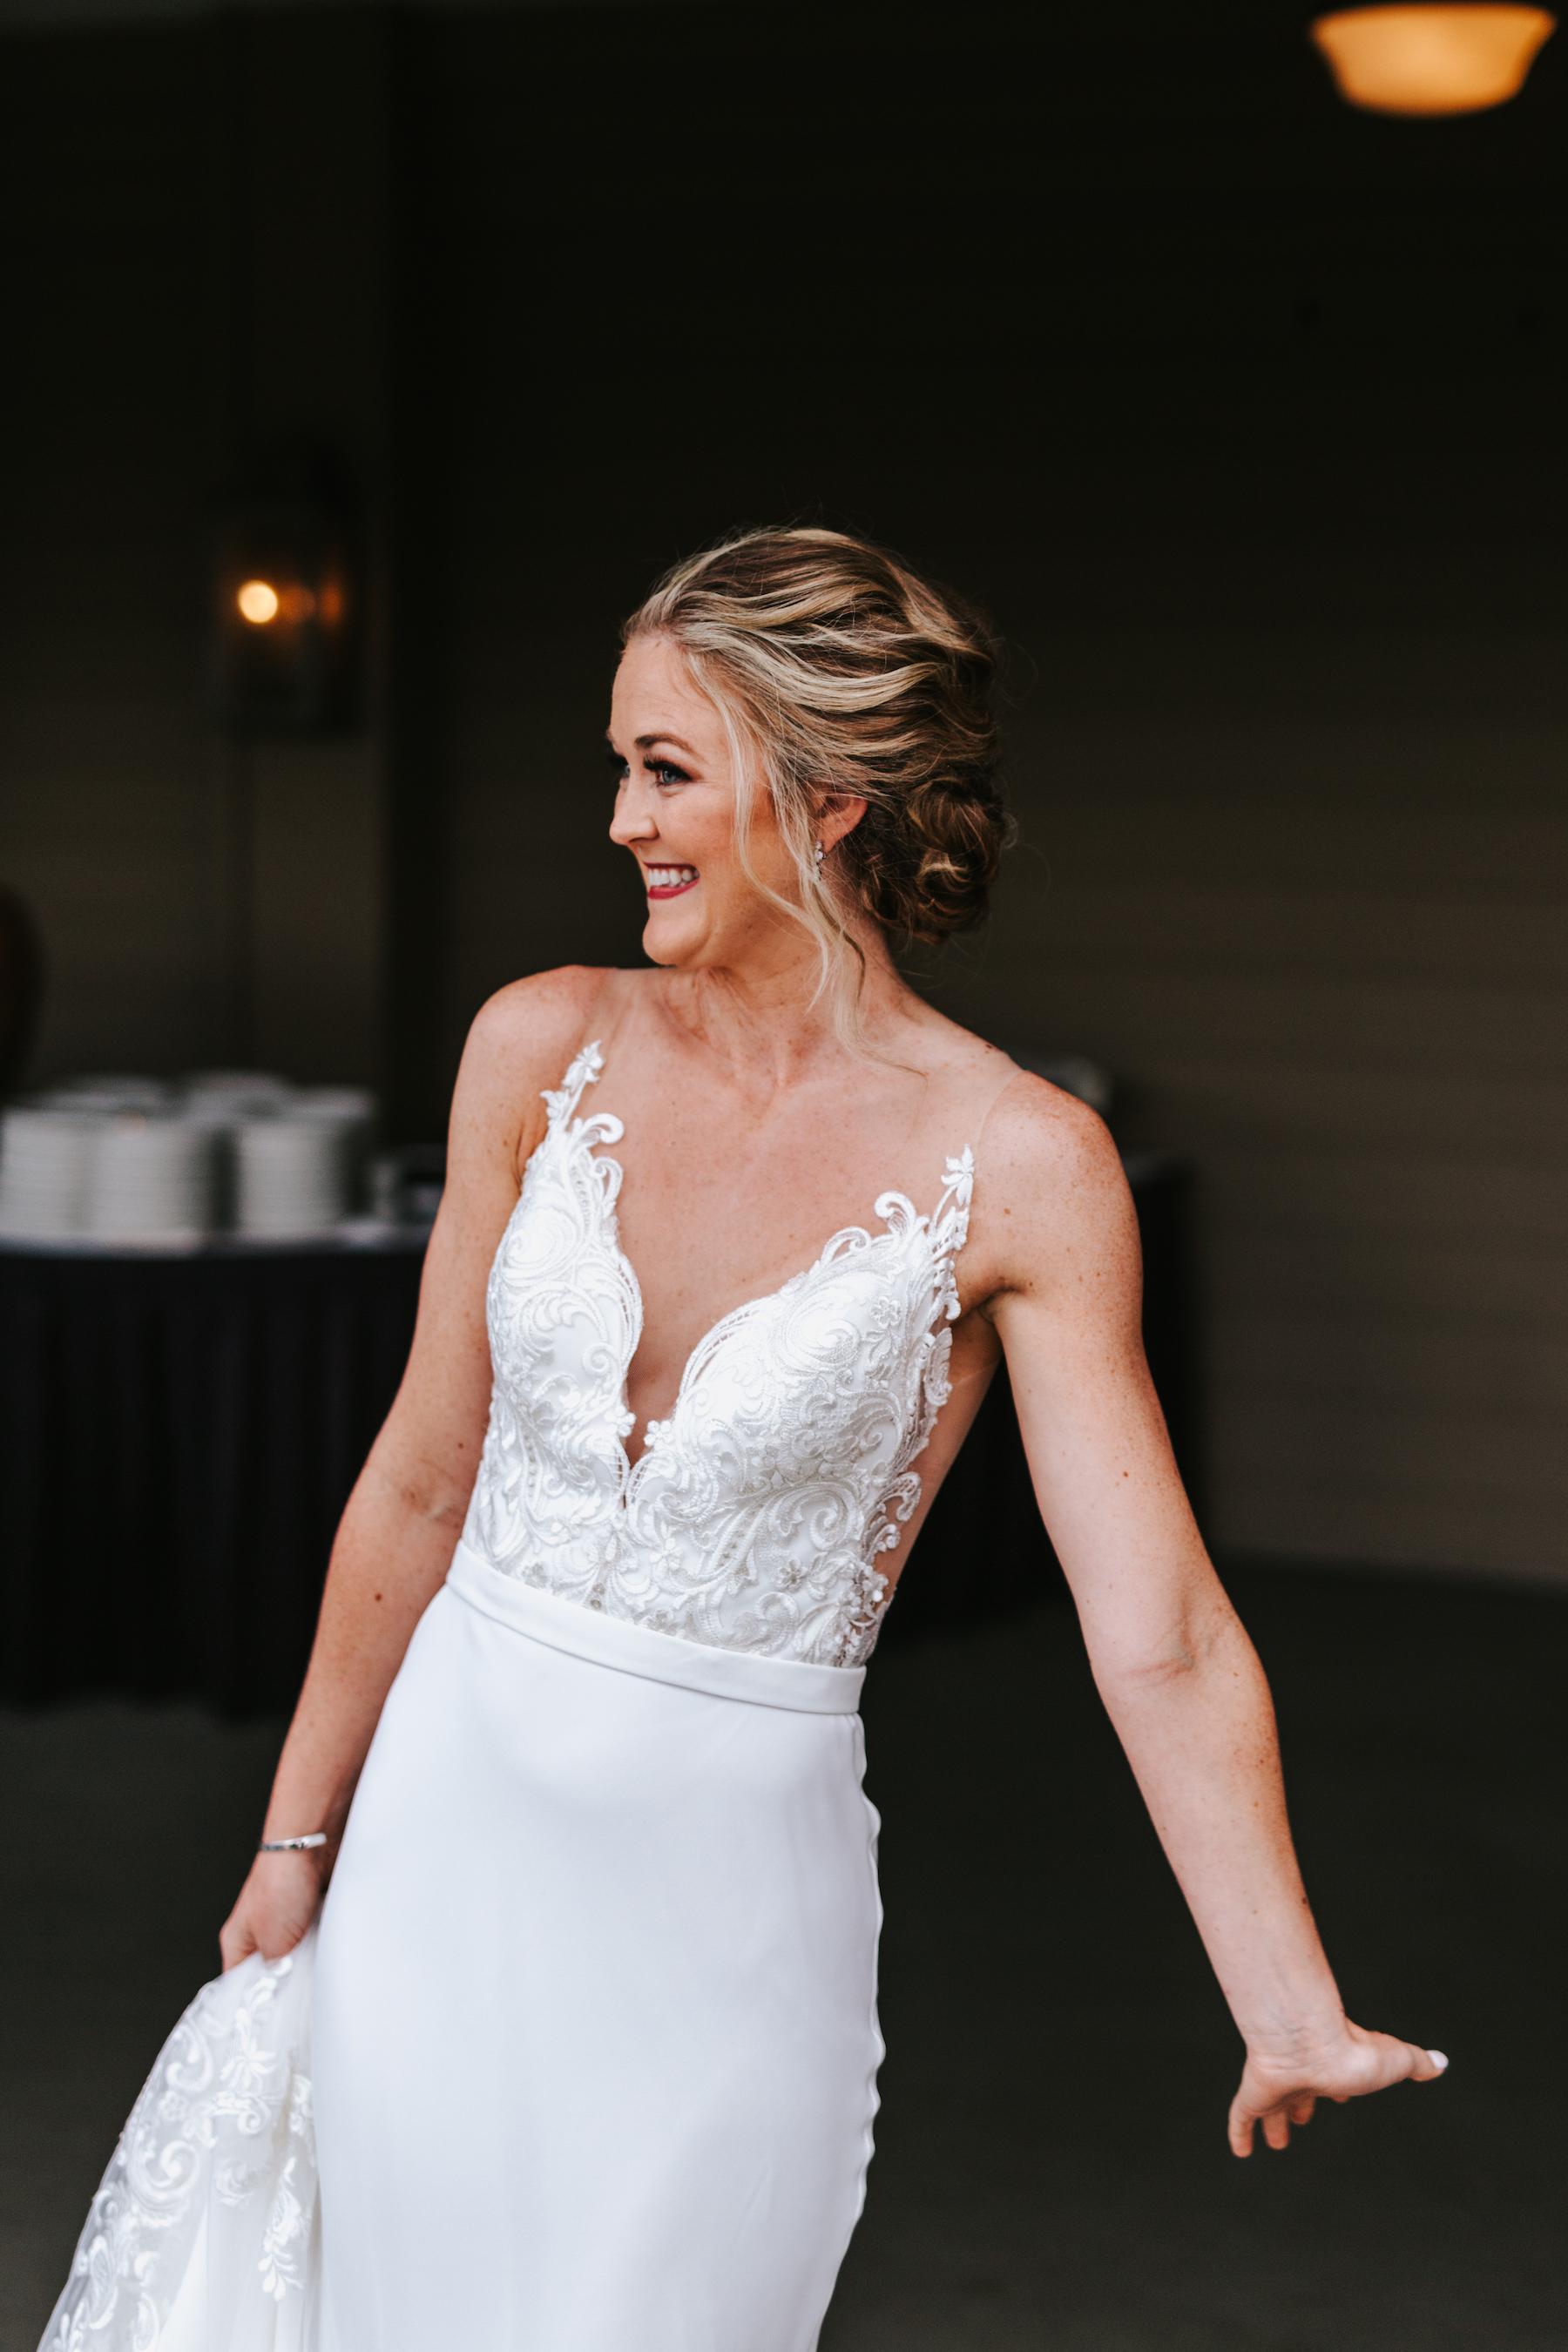 wedding-engagement-photographer-spartanburg-greenville-columbia-carolina-south-north-463.JPG